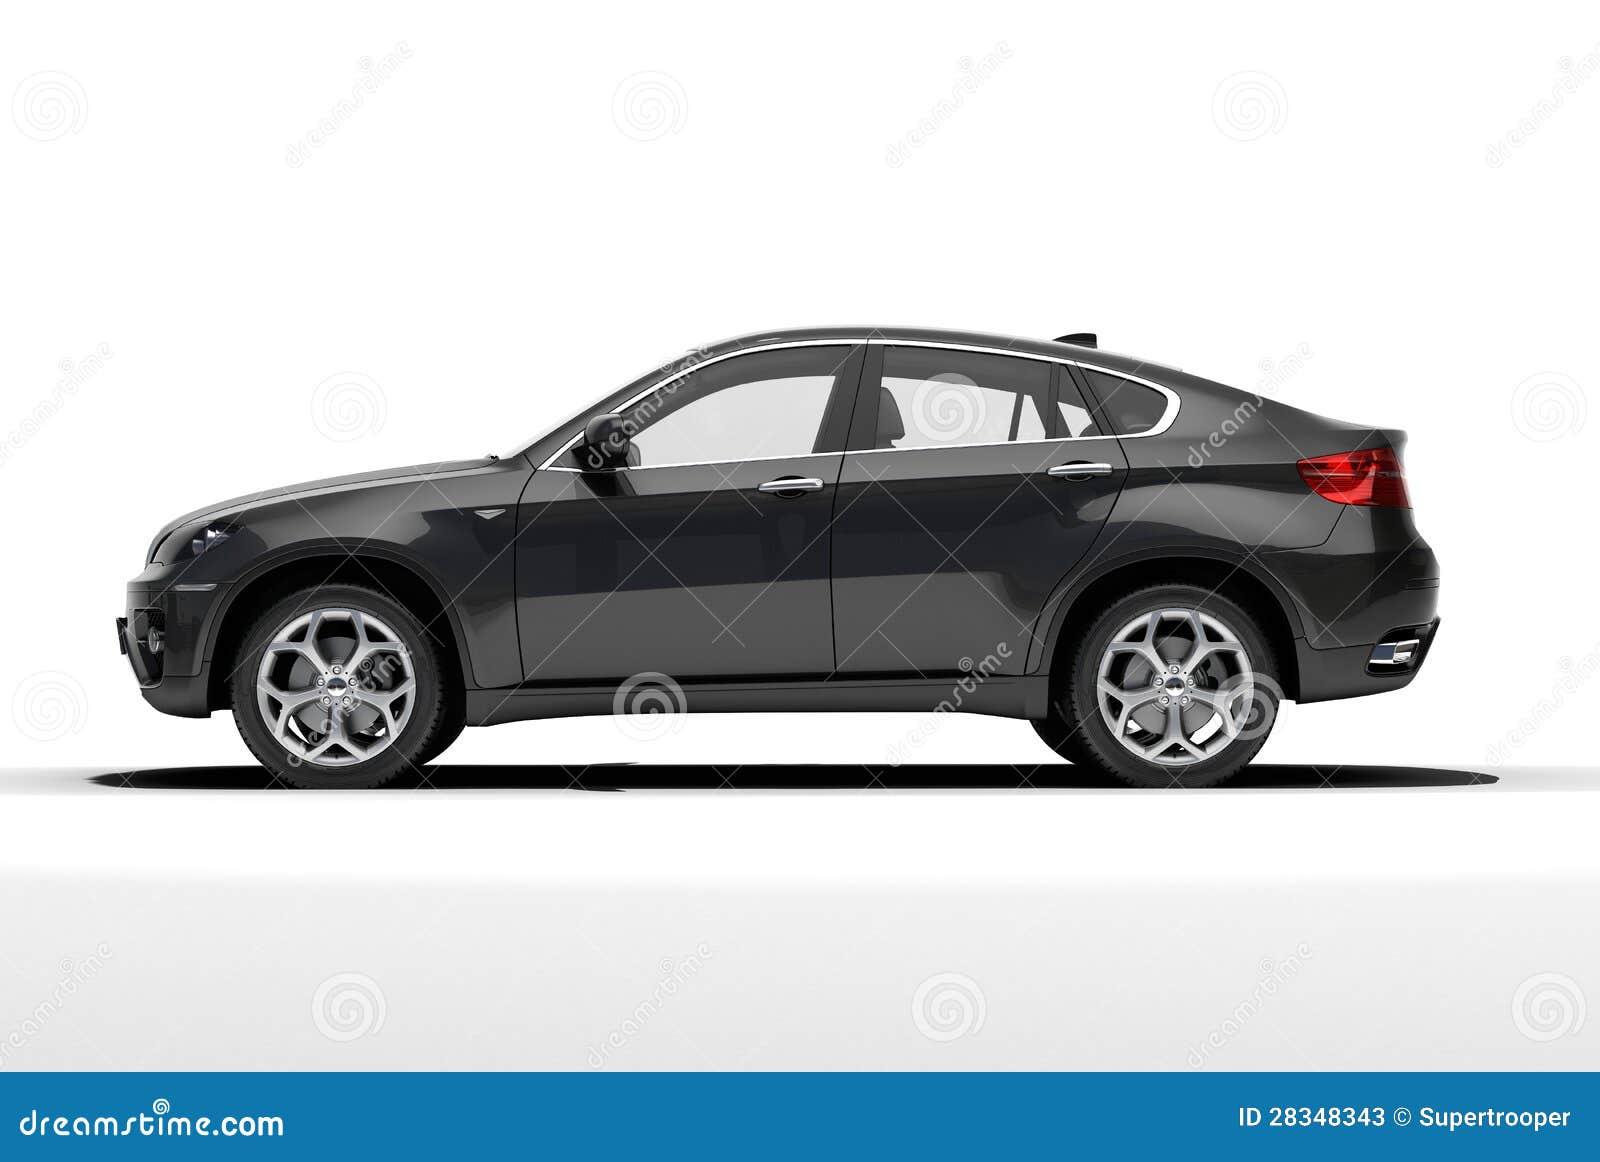 Contemporary Luxury Car Stock Photos Image 28348343